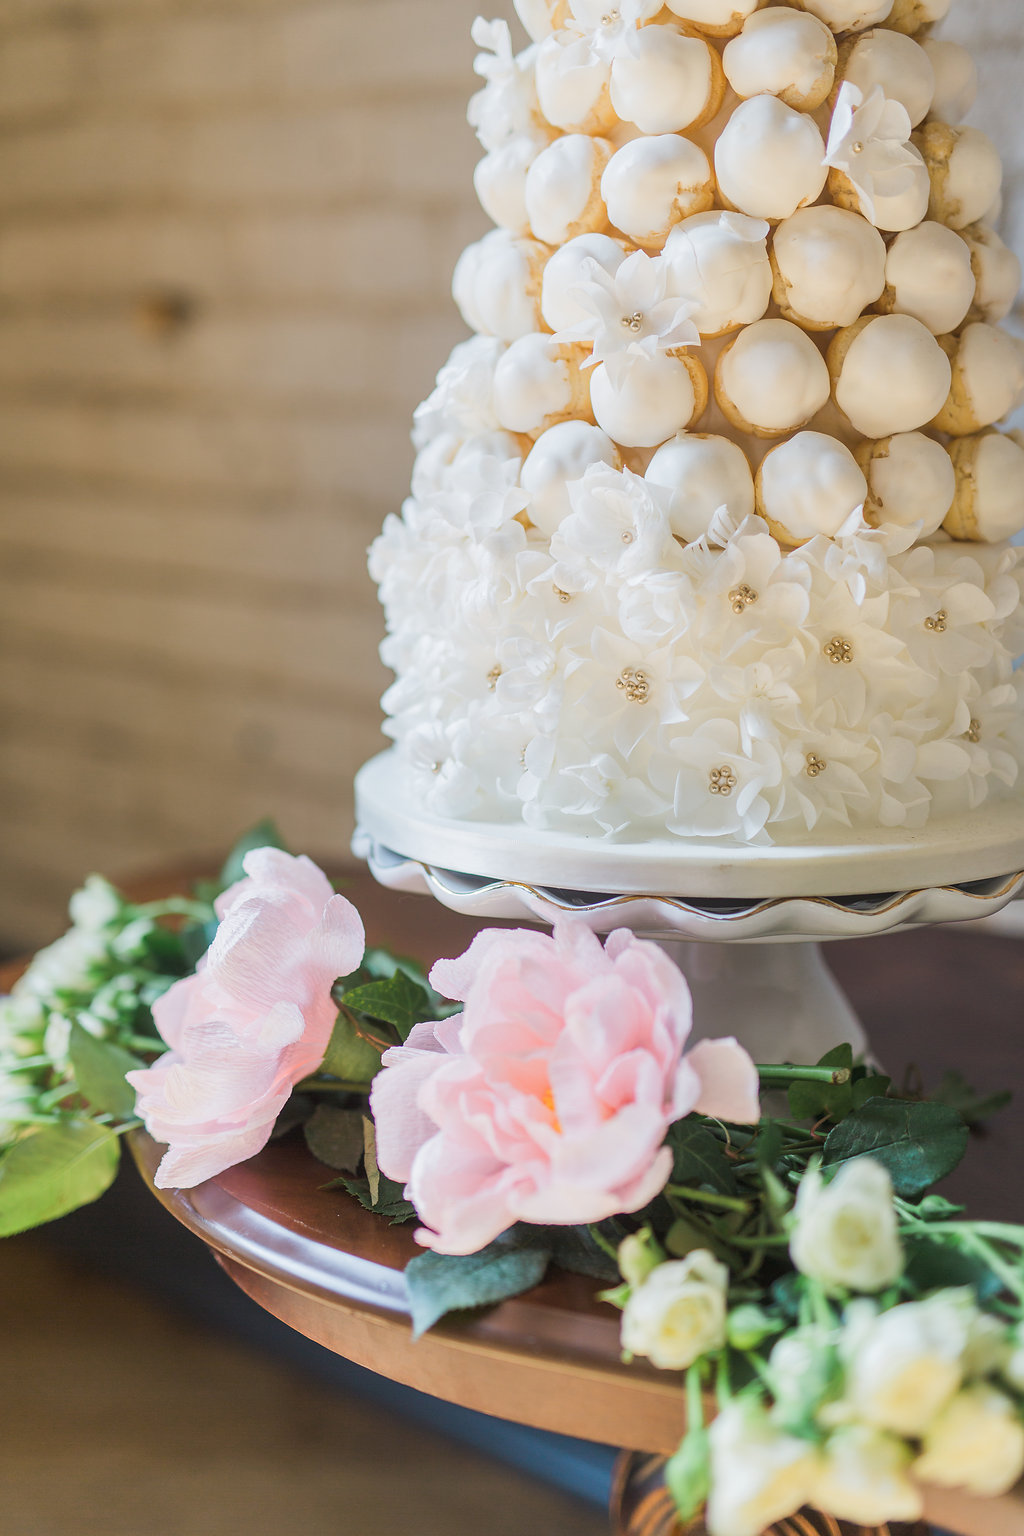 Phoebe Lo Events Toronto Wedding - Storys Building Urban Loft Paper Inspired Wedding 033.jpg